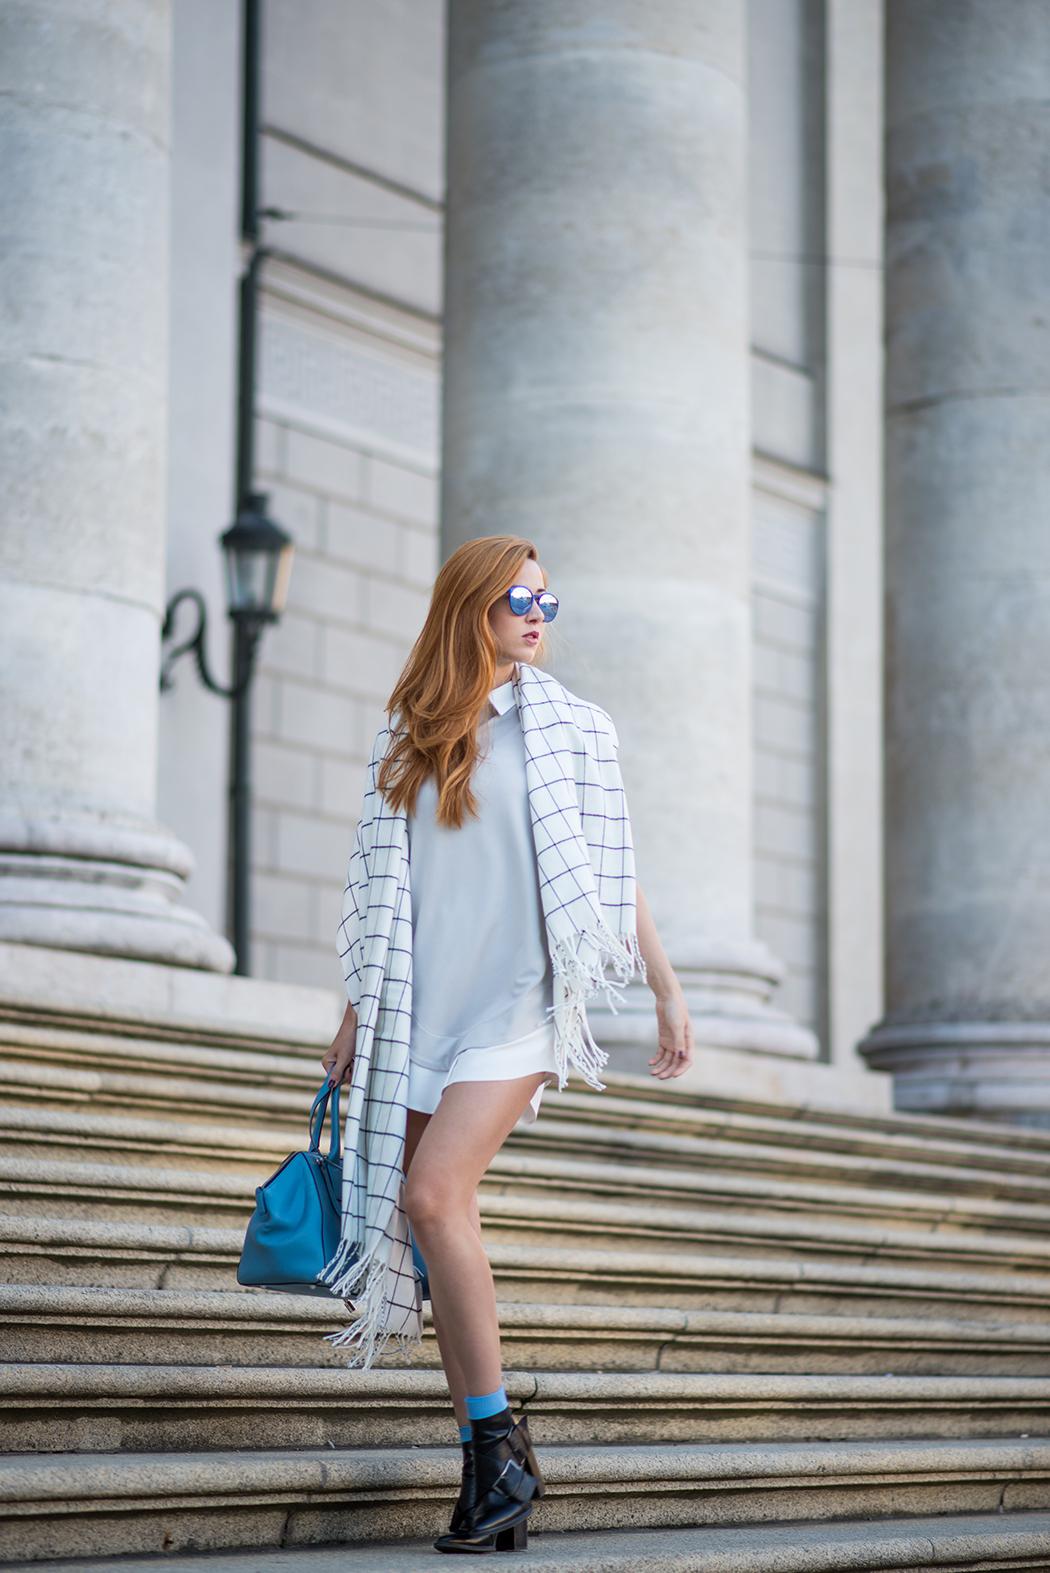 Fashionblog-Fashionblogger-München-Deutschland-Fashion-Blog-Lifestyle-Lindarella-Linda-Rella-Hemdkleid-Marc-Jacobs-Le_Specs-blau-verspiegelt-1-web